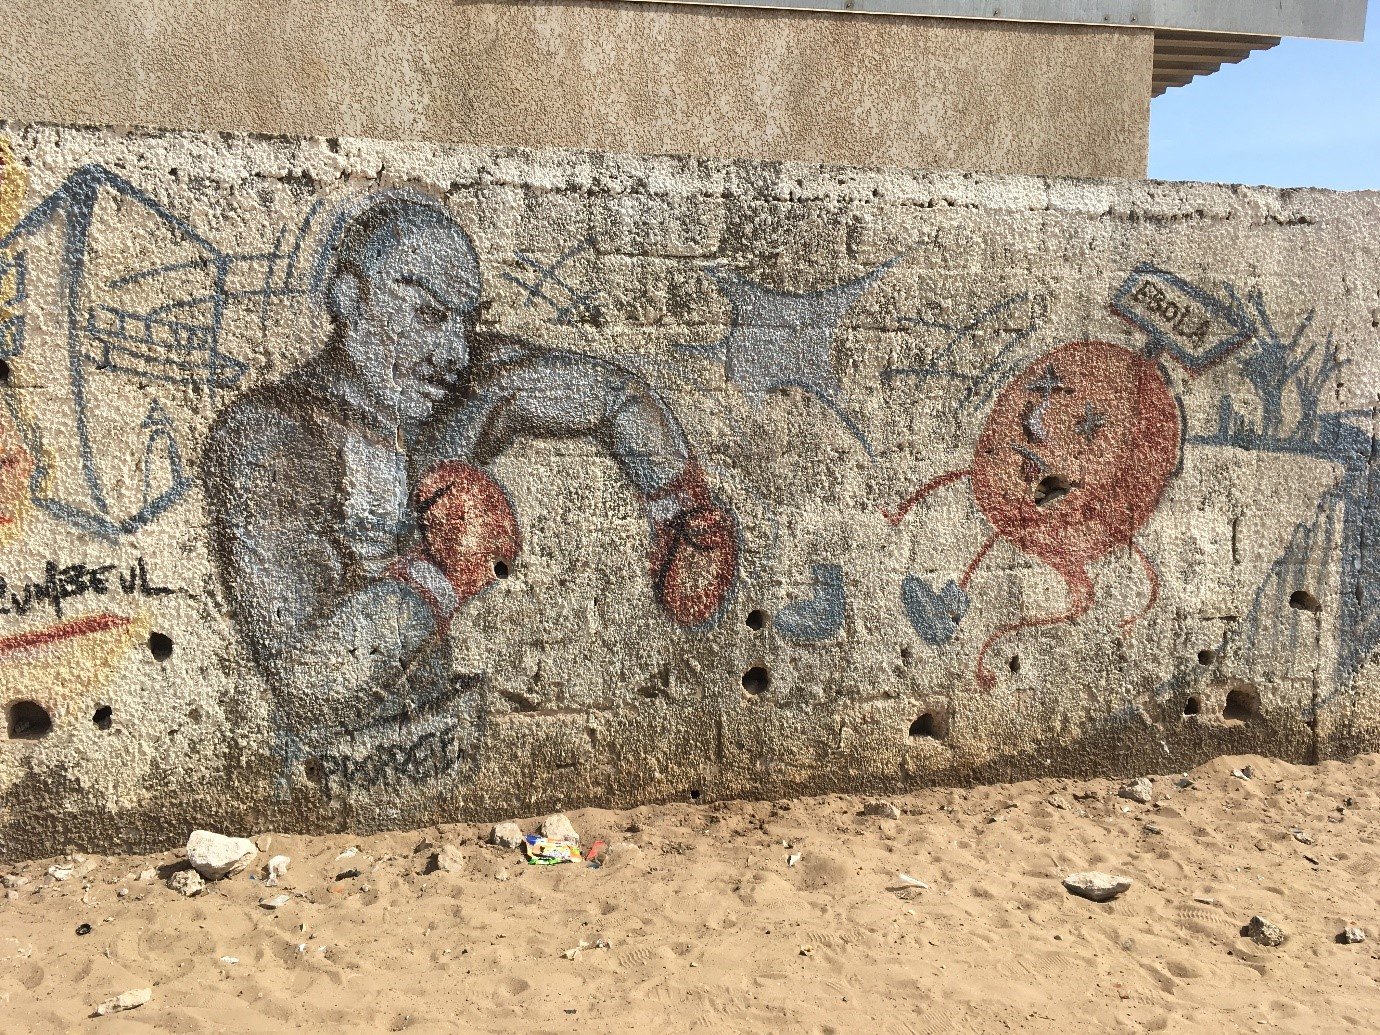 Ebola mural in Guediawaye, 2017